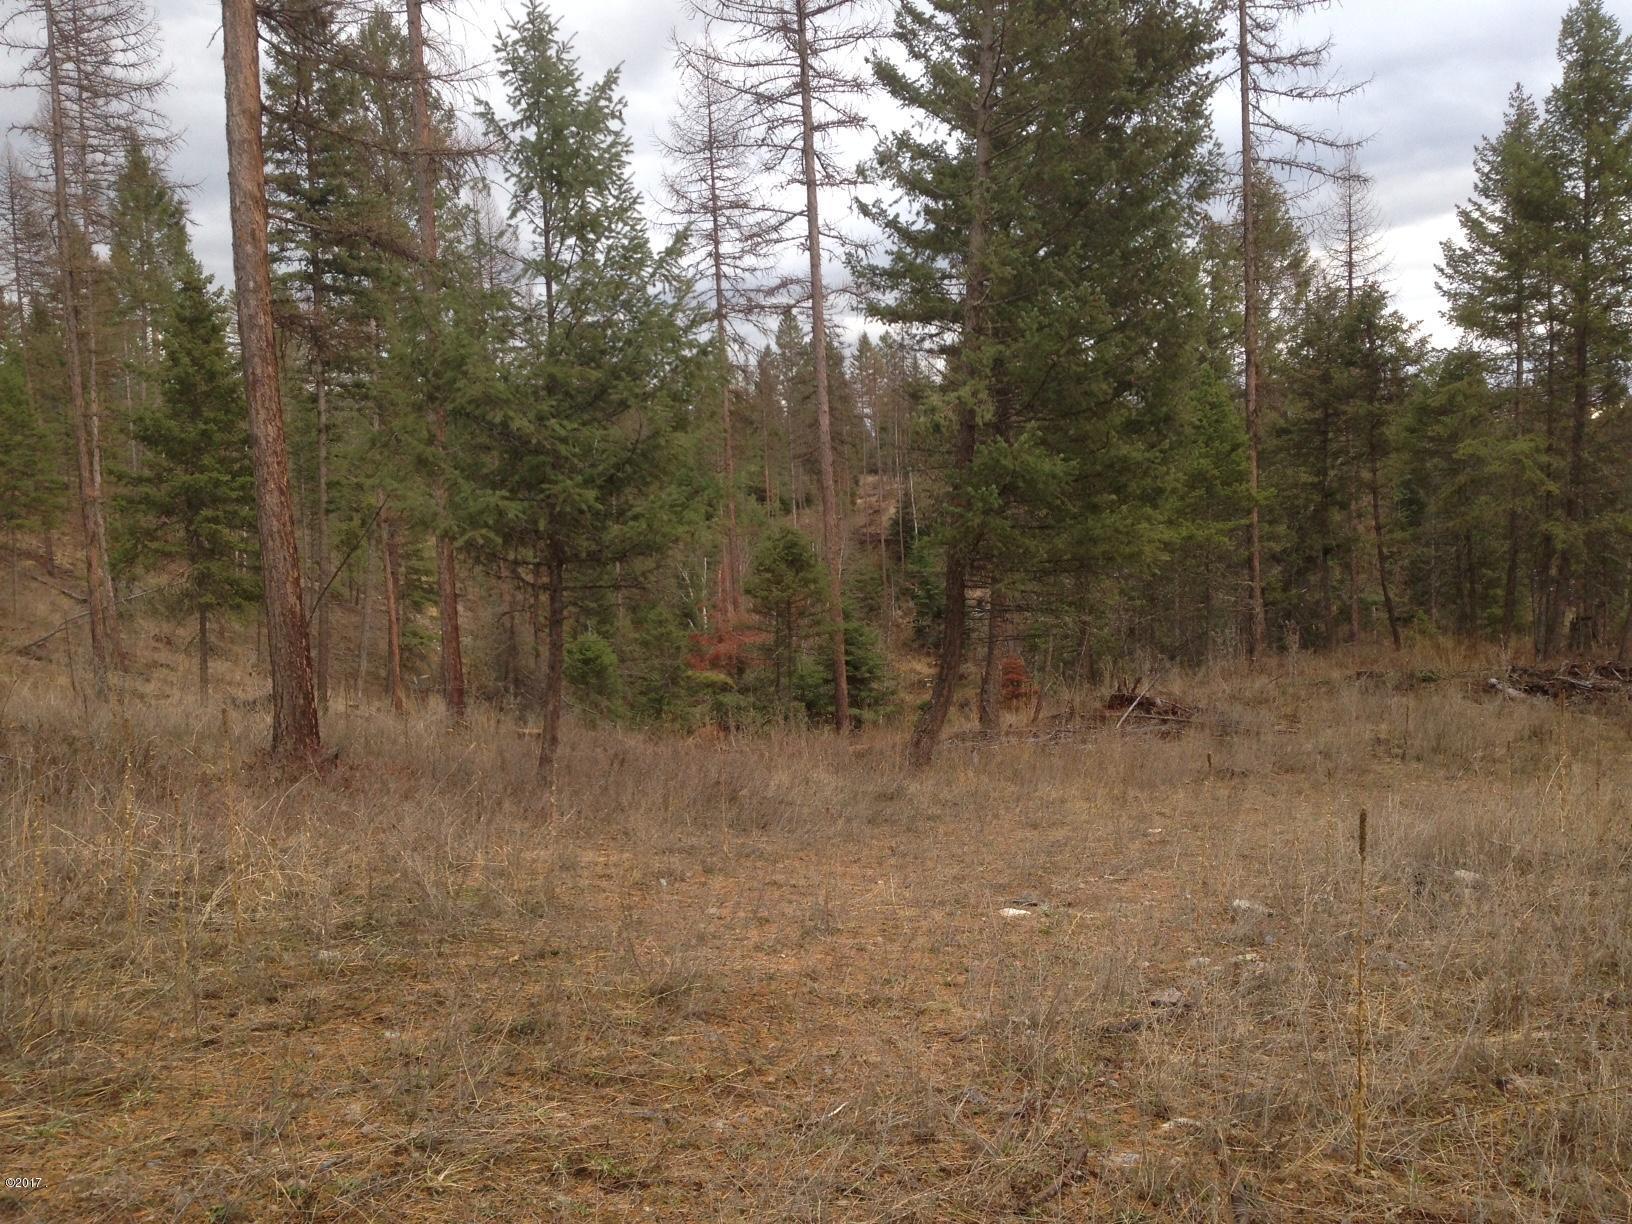 Additional photo for property listing at 395 Kauffman Lane 395 Kauffman Lane Kalispell, Montana 59901 United States